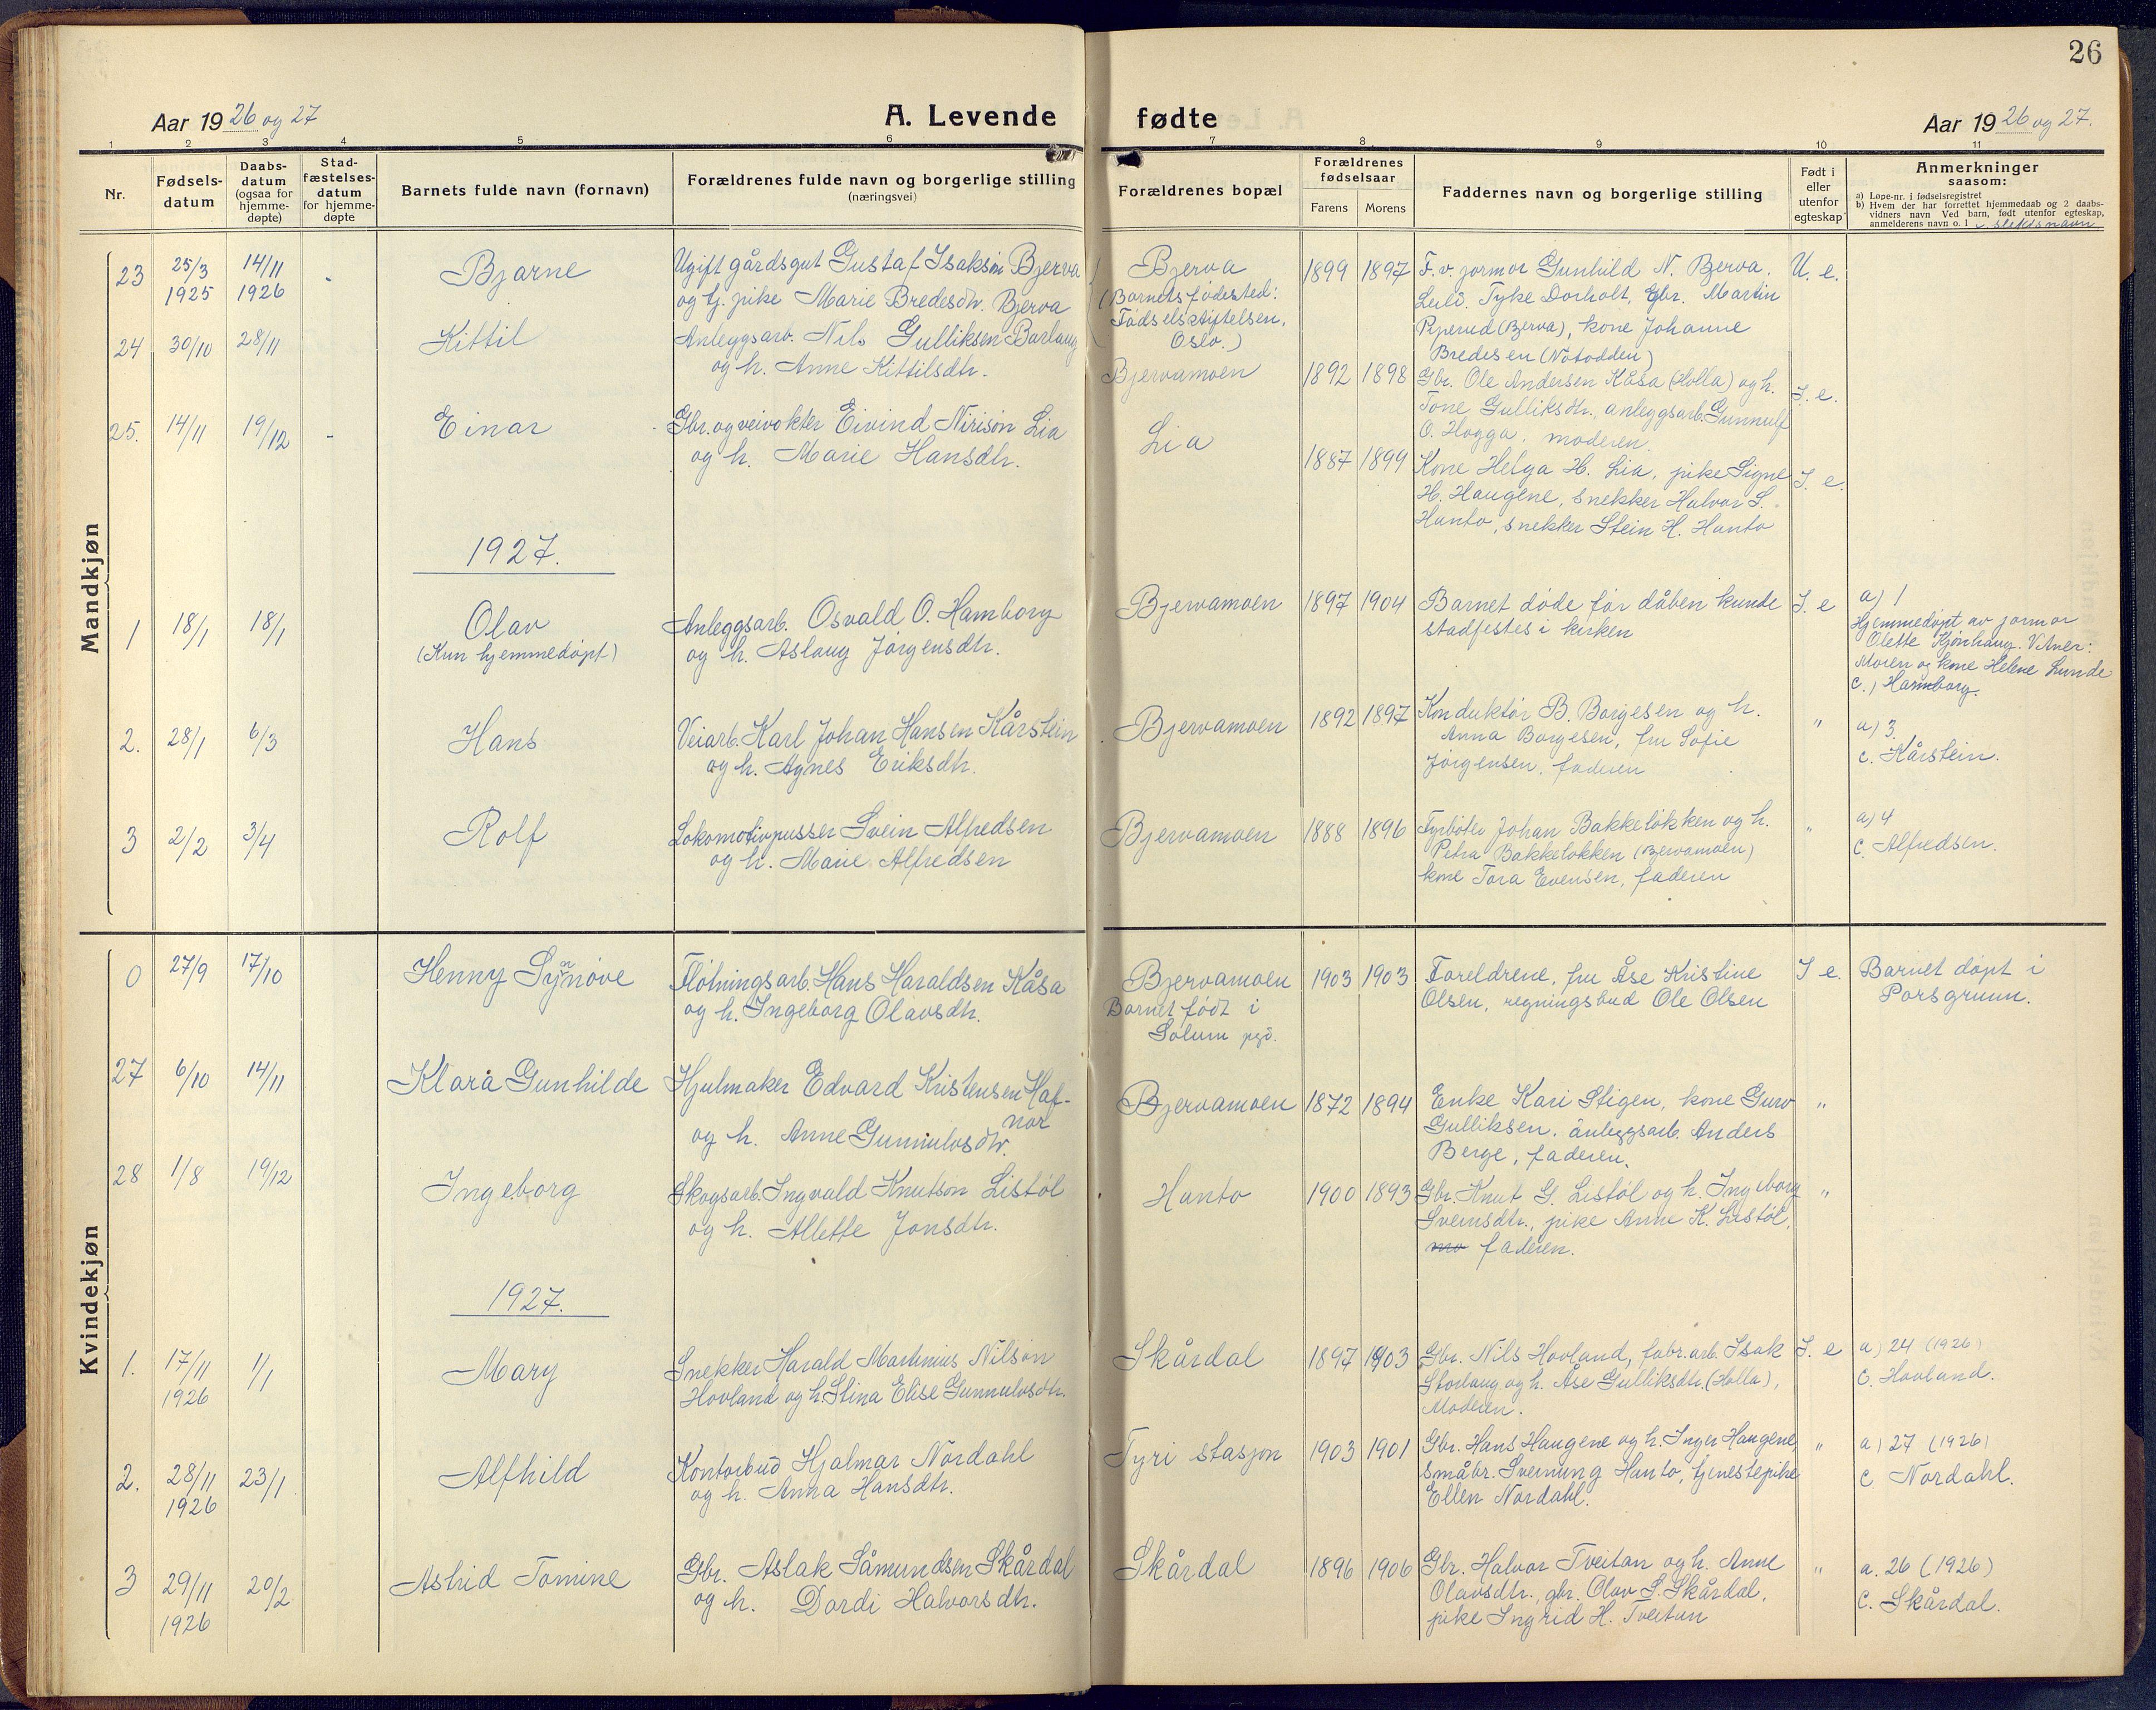 SAKO, Lunde kirkebøker, F/Fa/L0006: Ministerialbok nr. I 6, 1922-1940, s. 26